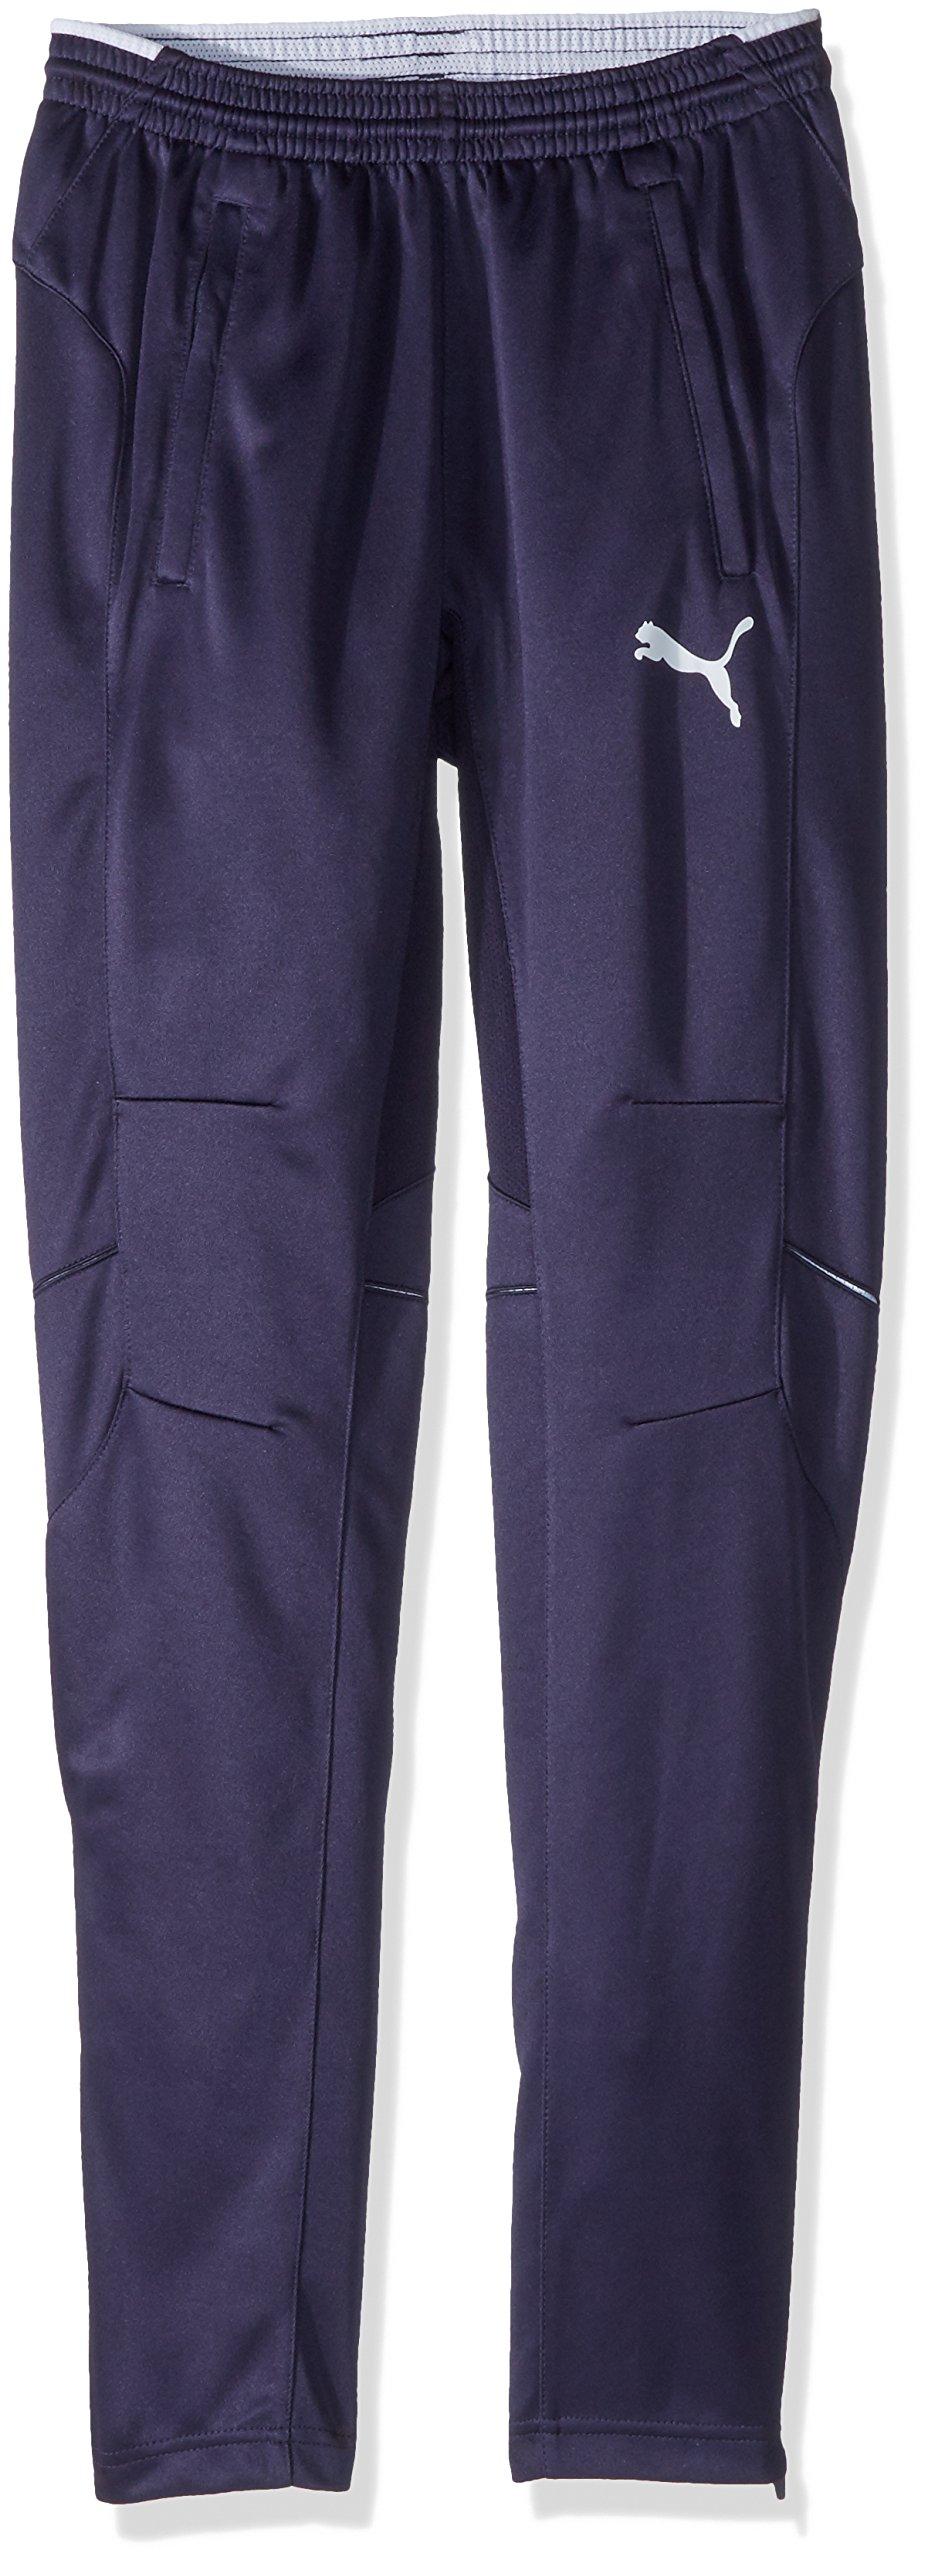 PUMA Men's Training Pant, New Navy/White, YXS